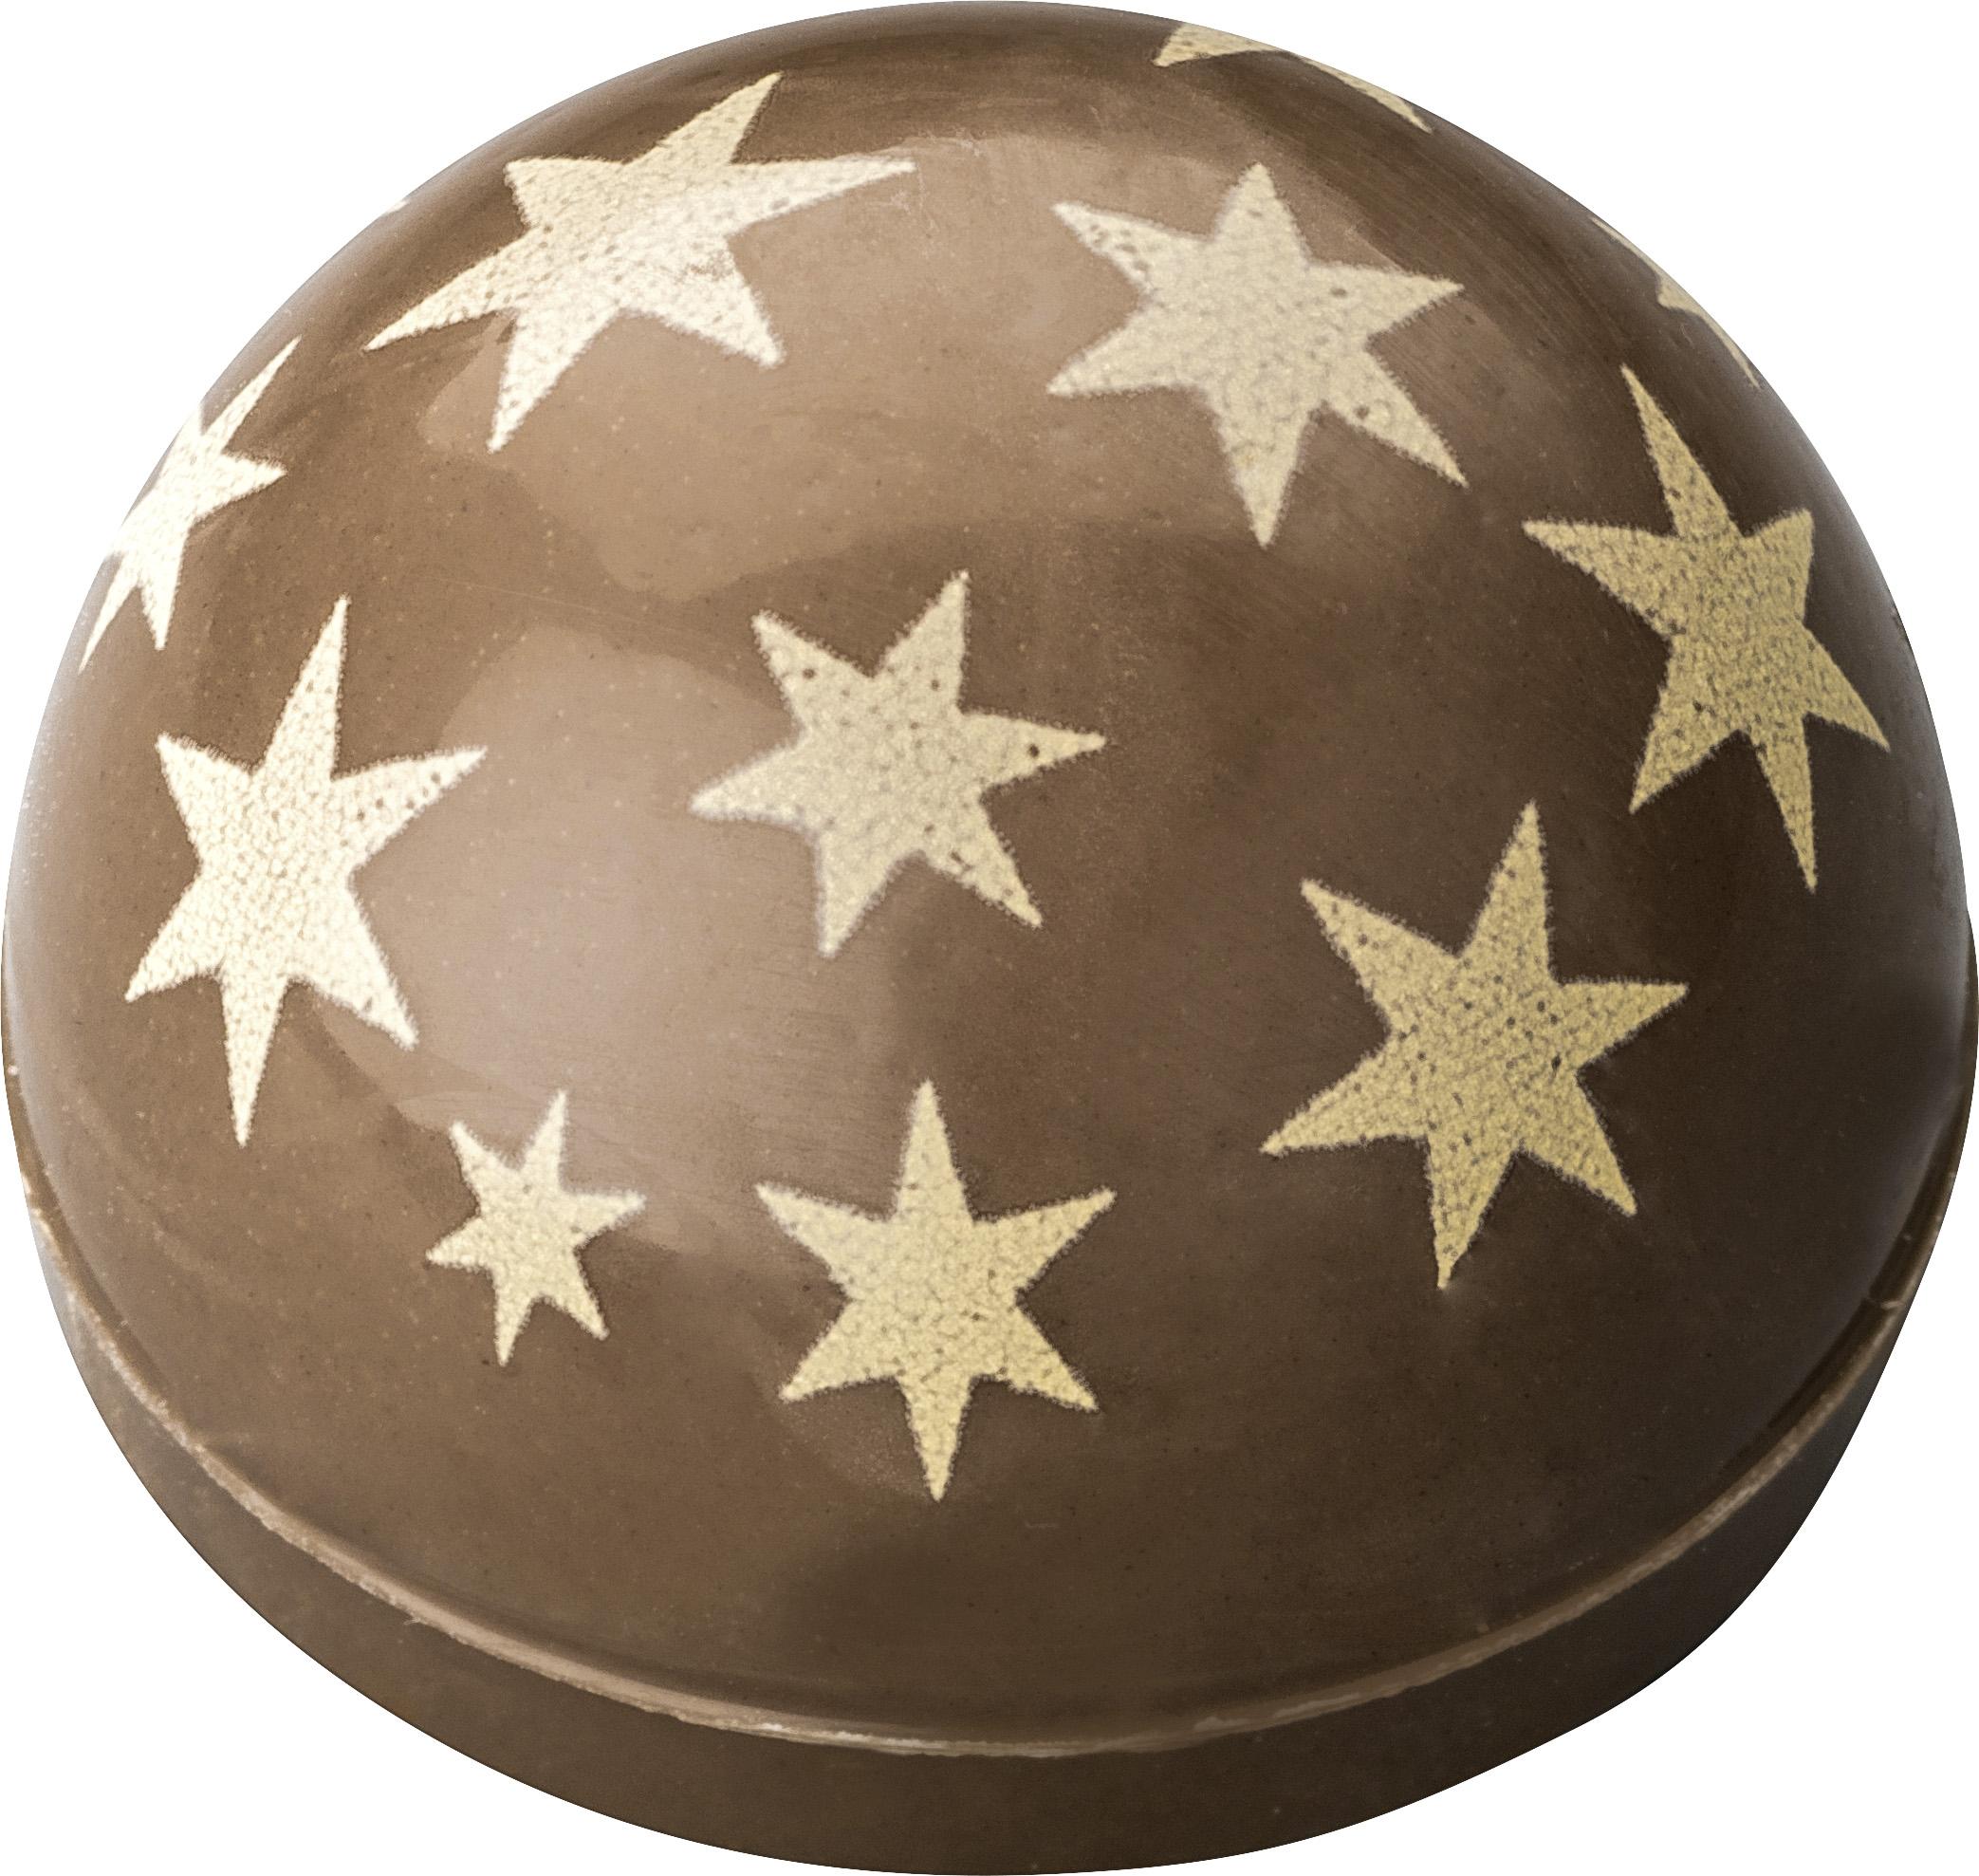 Pralinen Hohlkörper Kuppel Dekor Sterne | Vollmilch